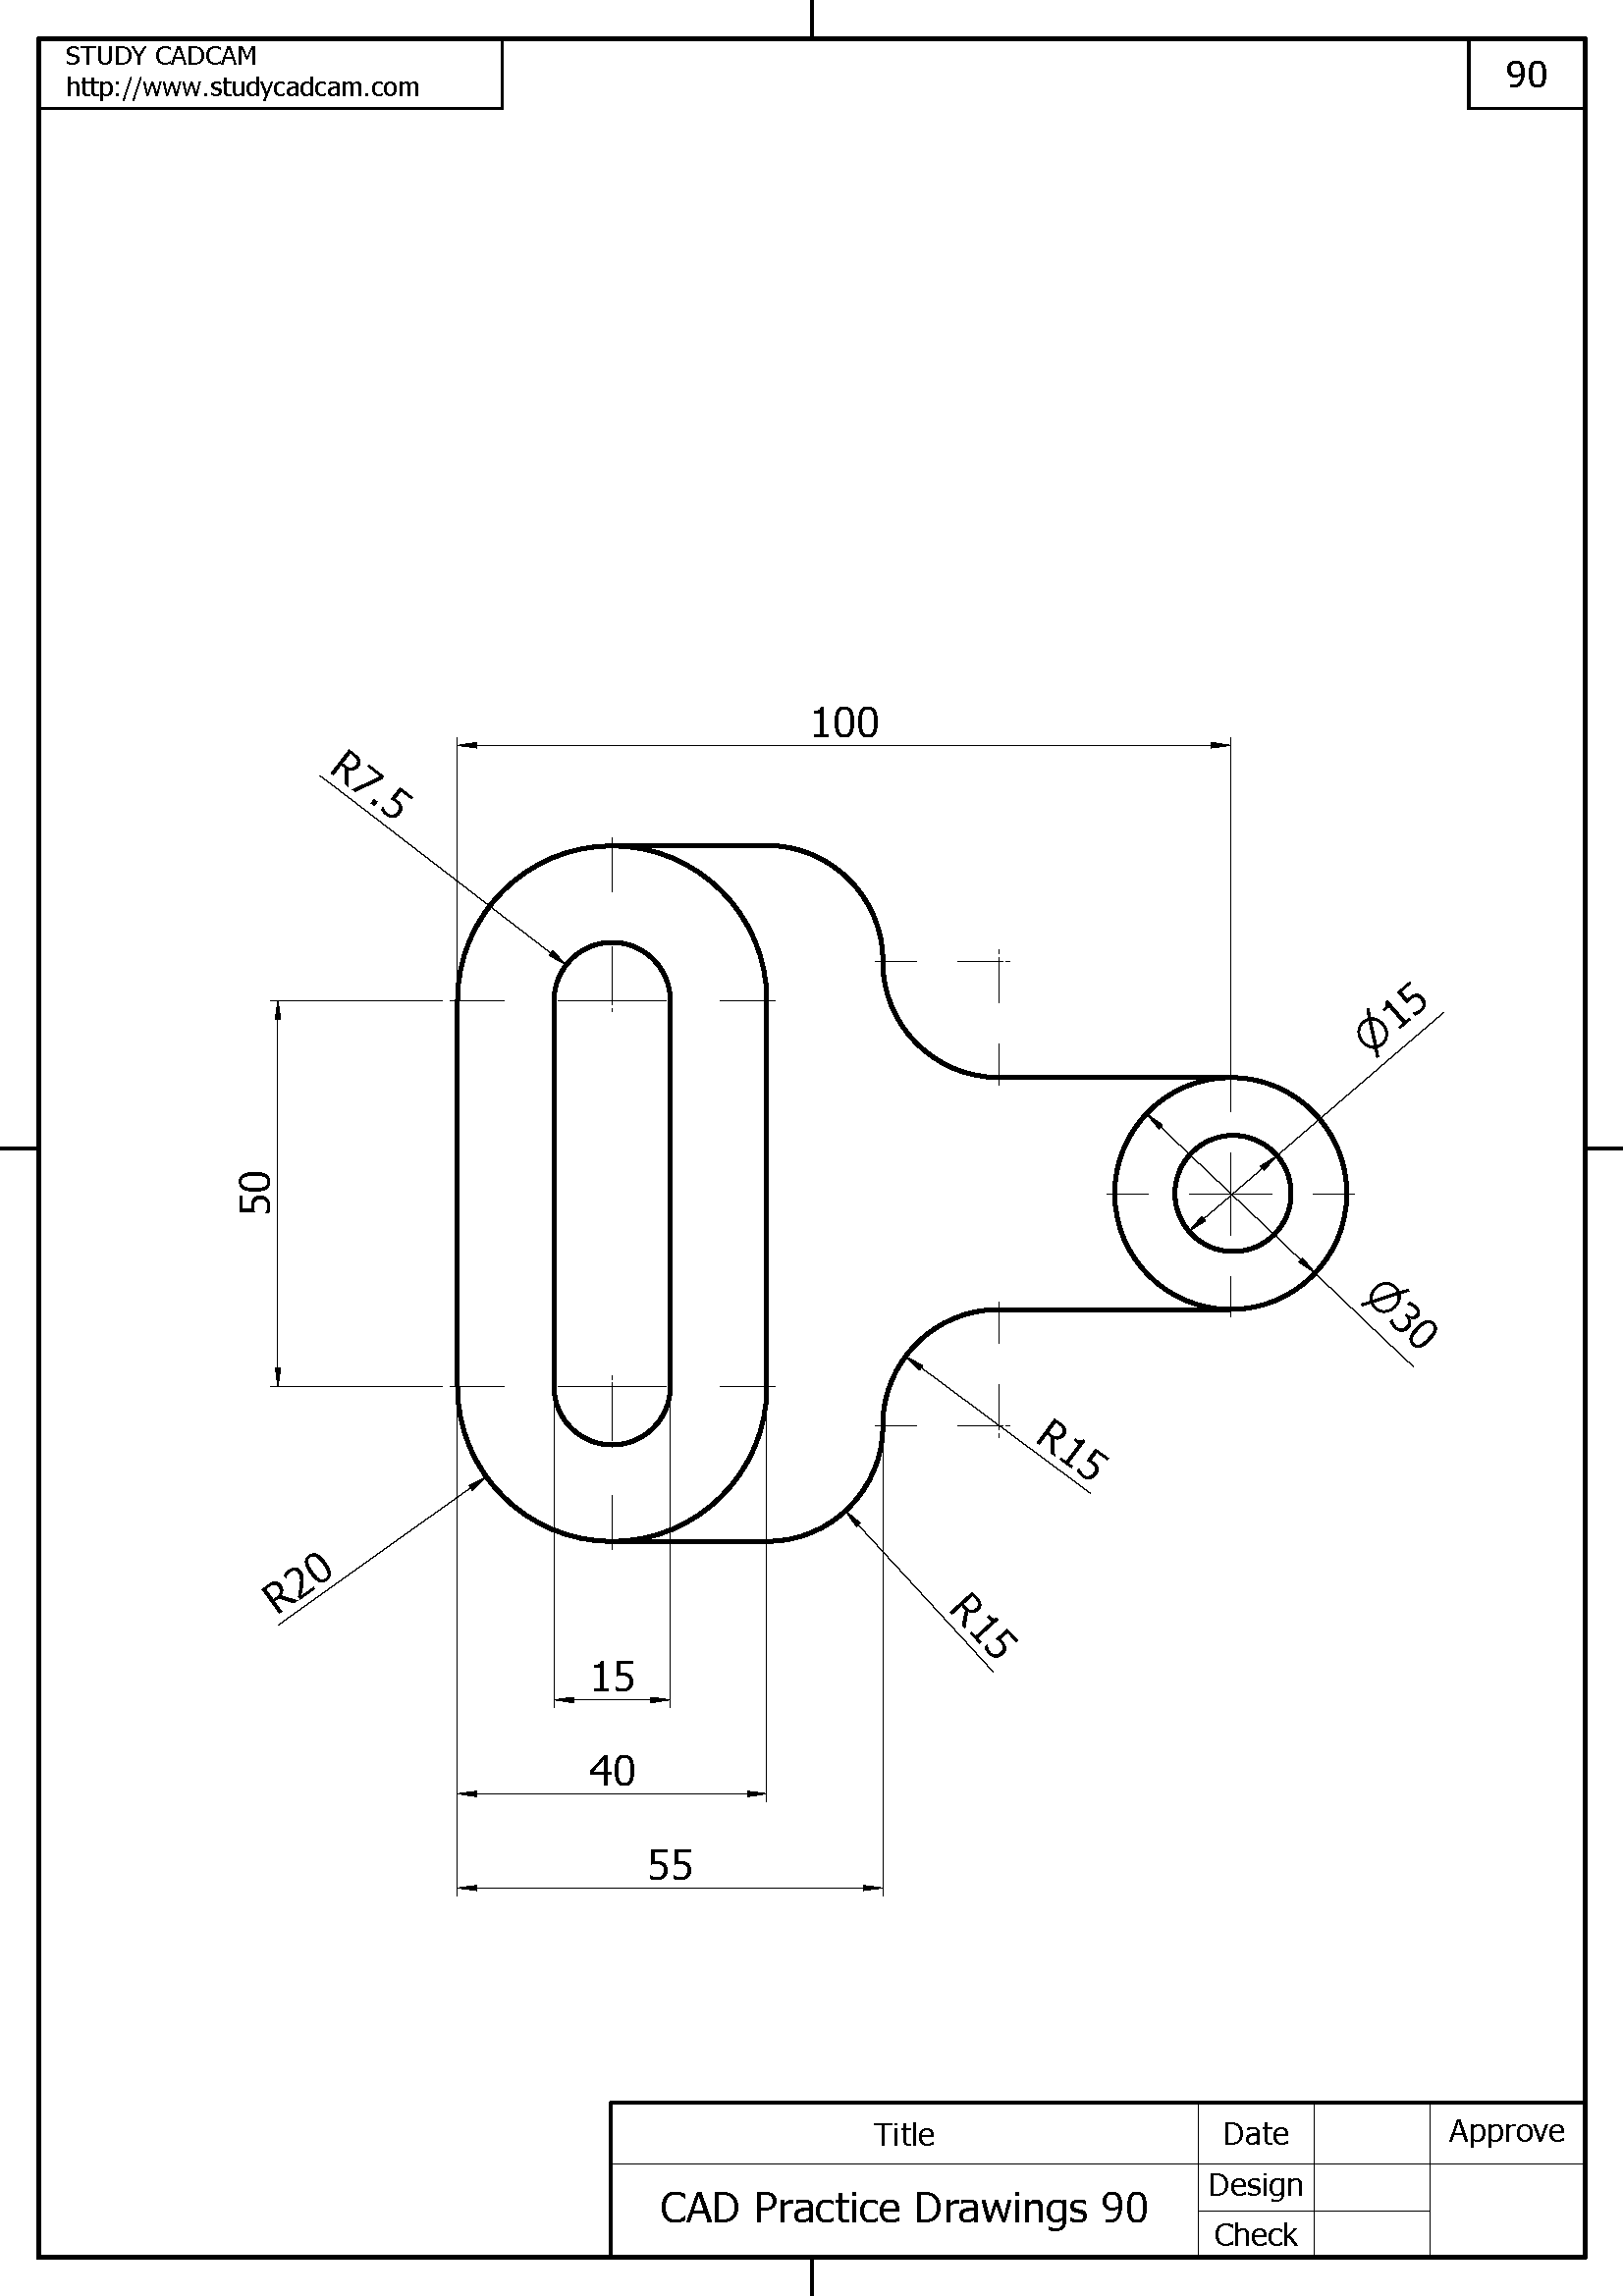 Cad Practice Drawings